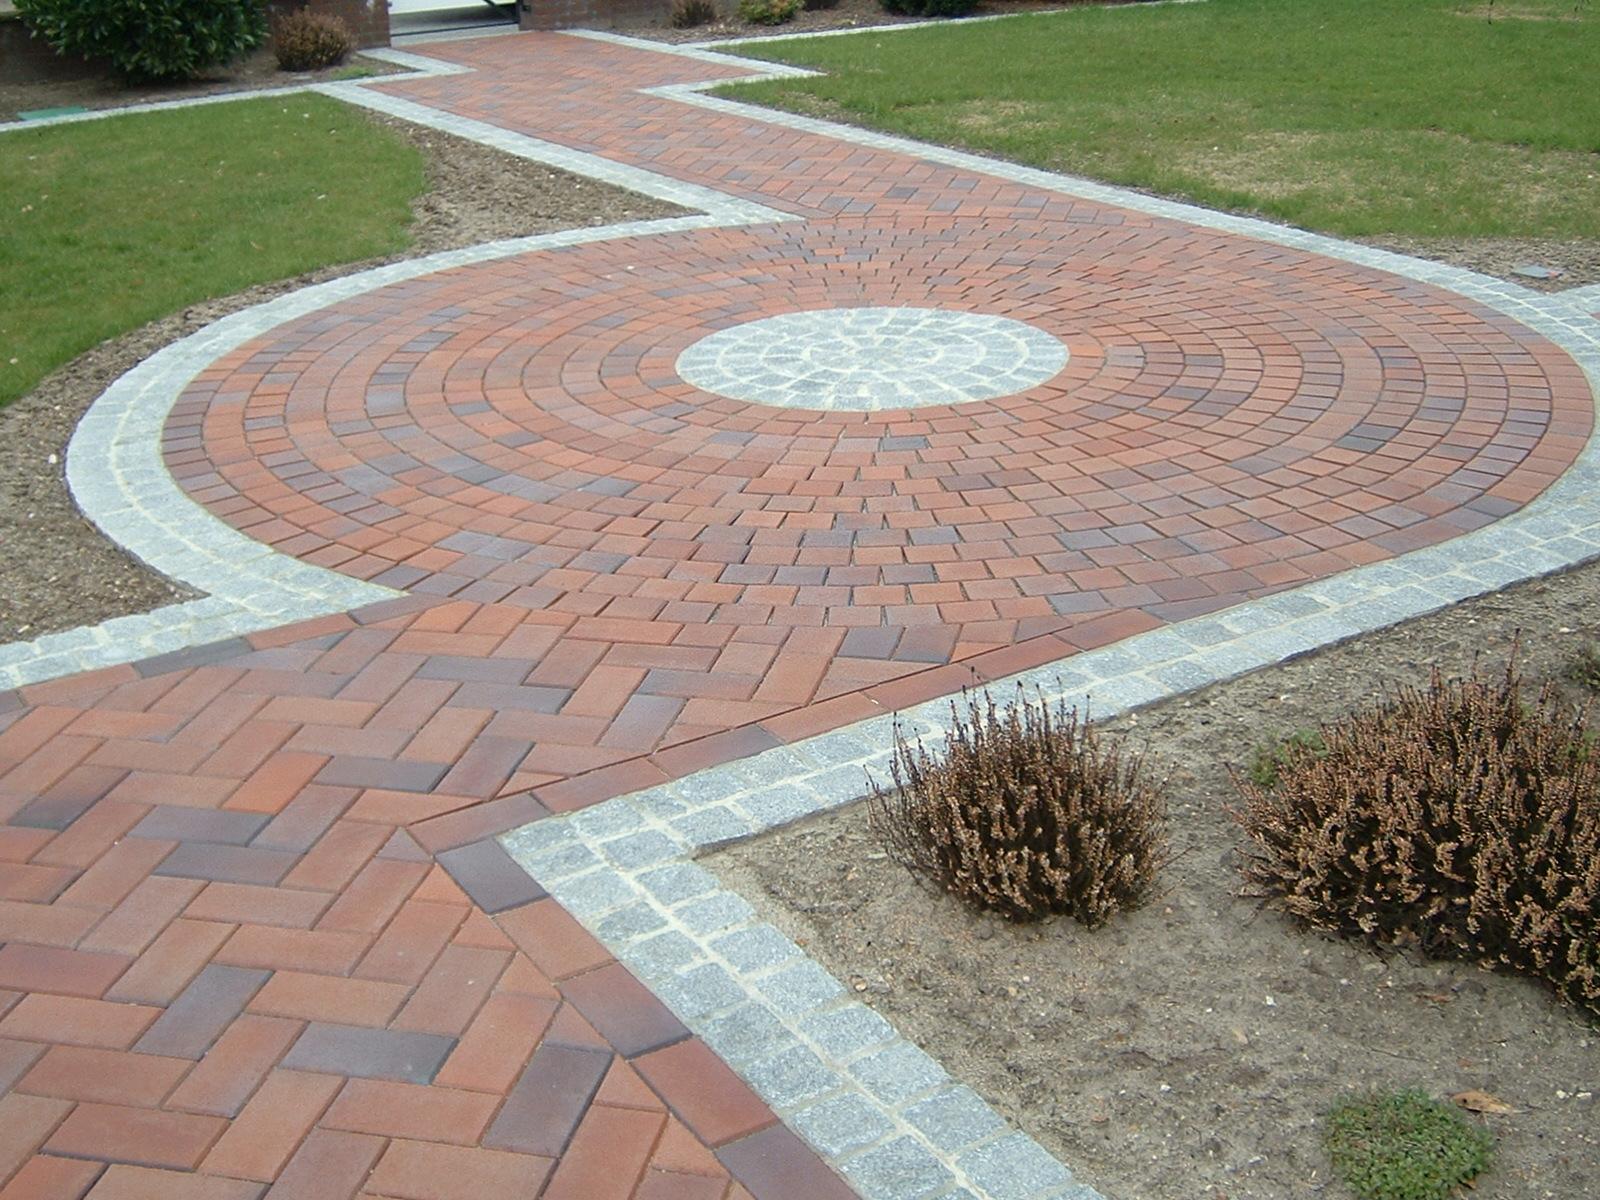 Укладка тротуарной плитки по кругу